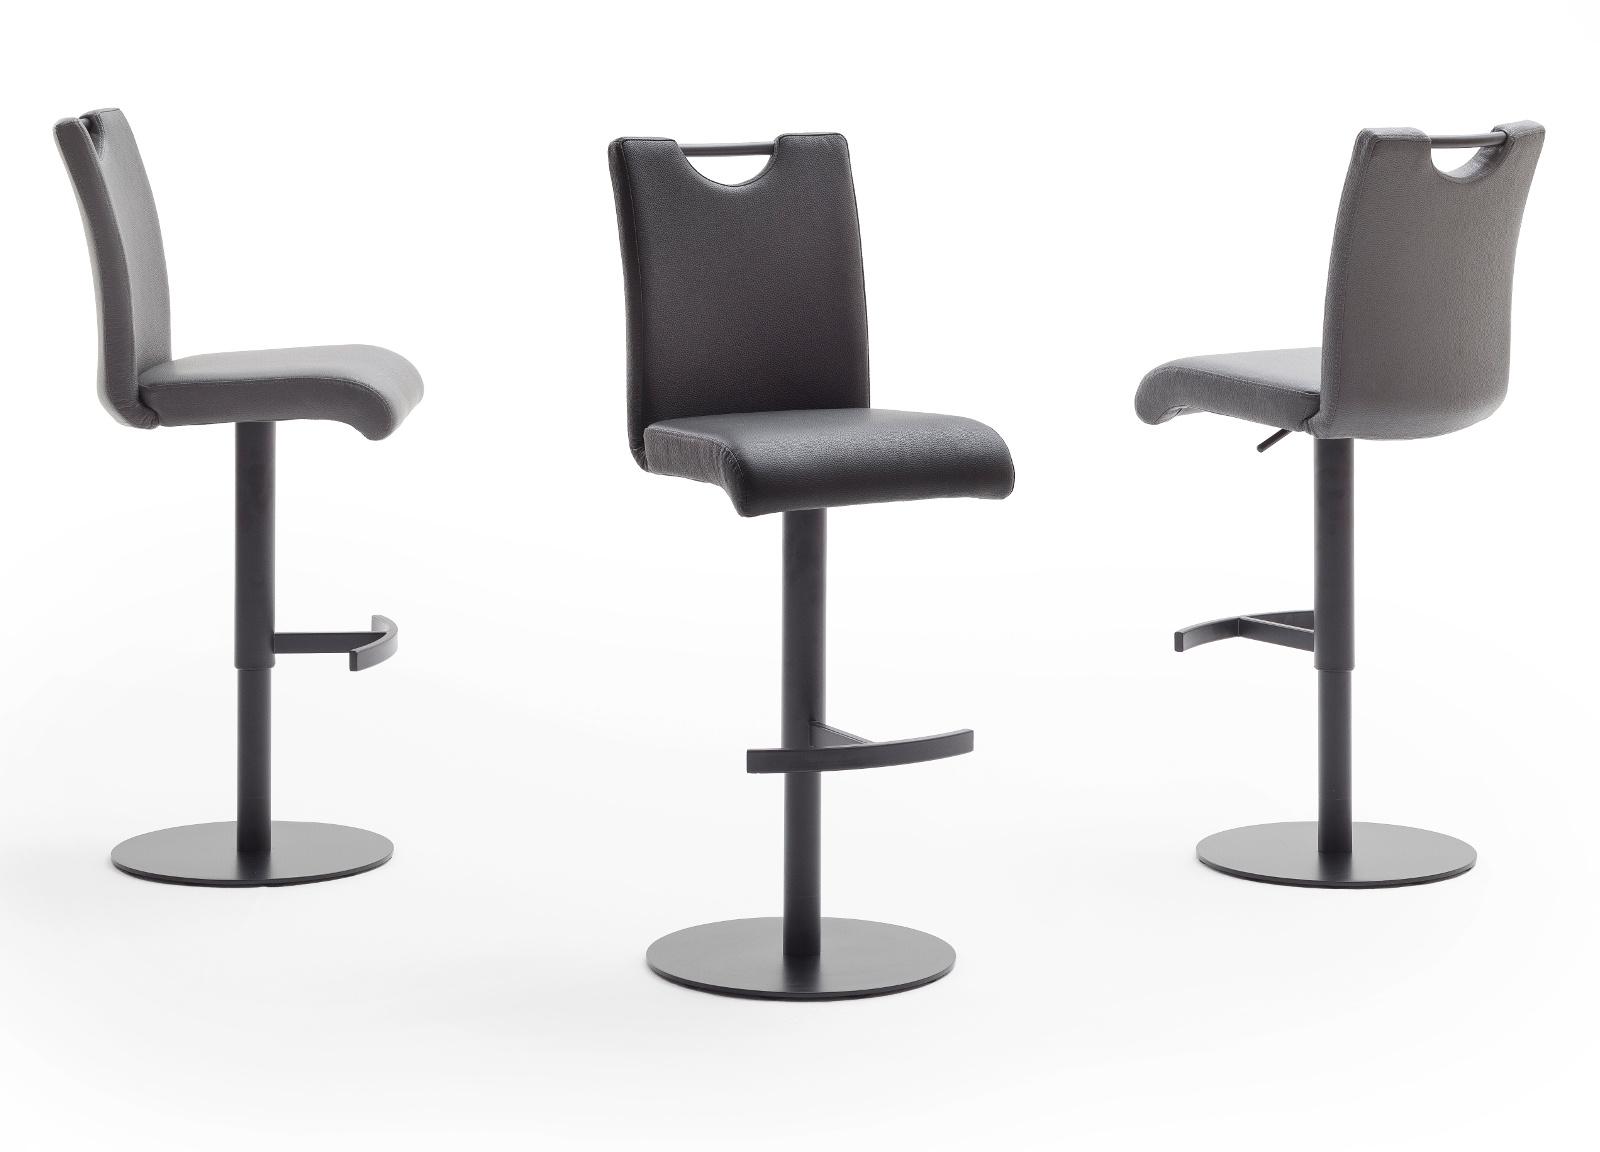 sideboard lowboard h ngend eiche matt lackiert italia day44 g nstige m bel online kaufen bei. Black Bedroom Furniture Sets. Home Design Ideas